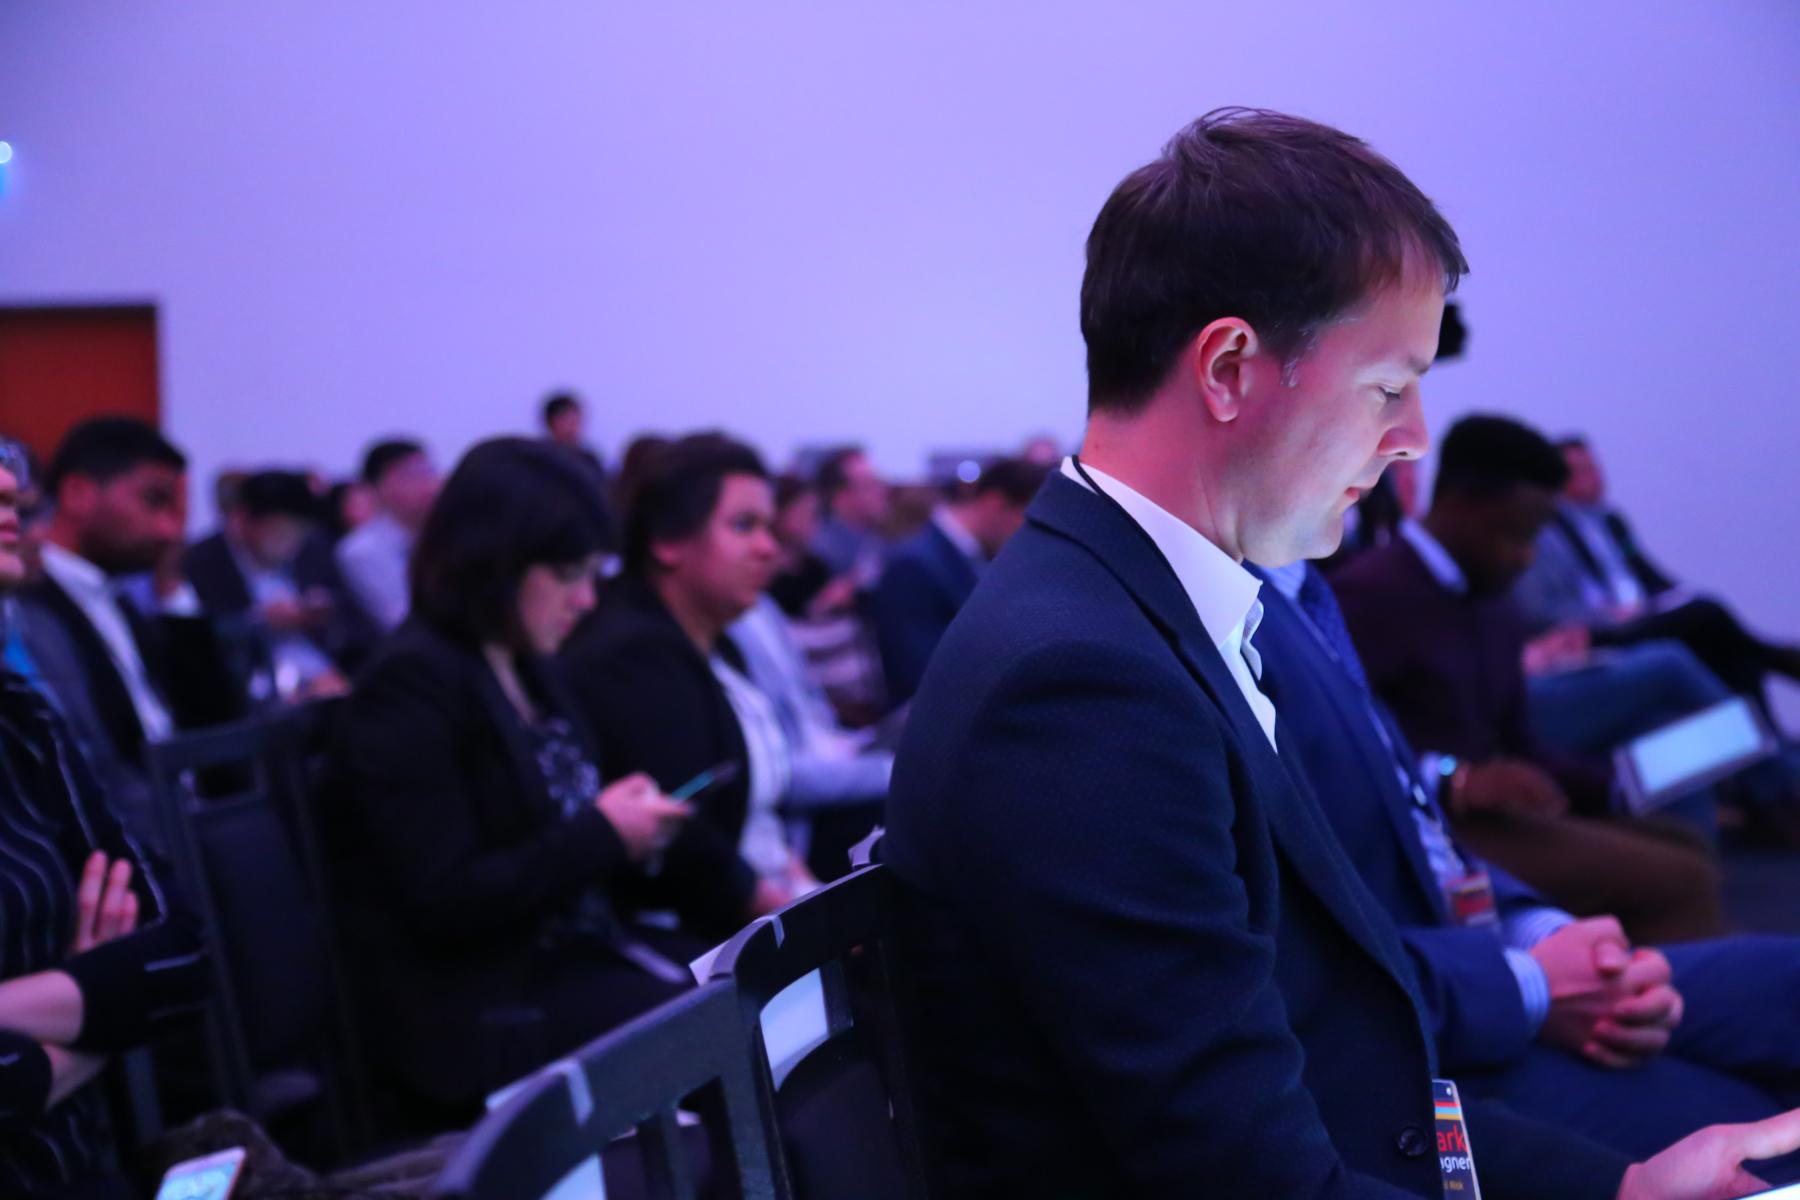 ABD_Conference_2018-074.jpg